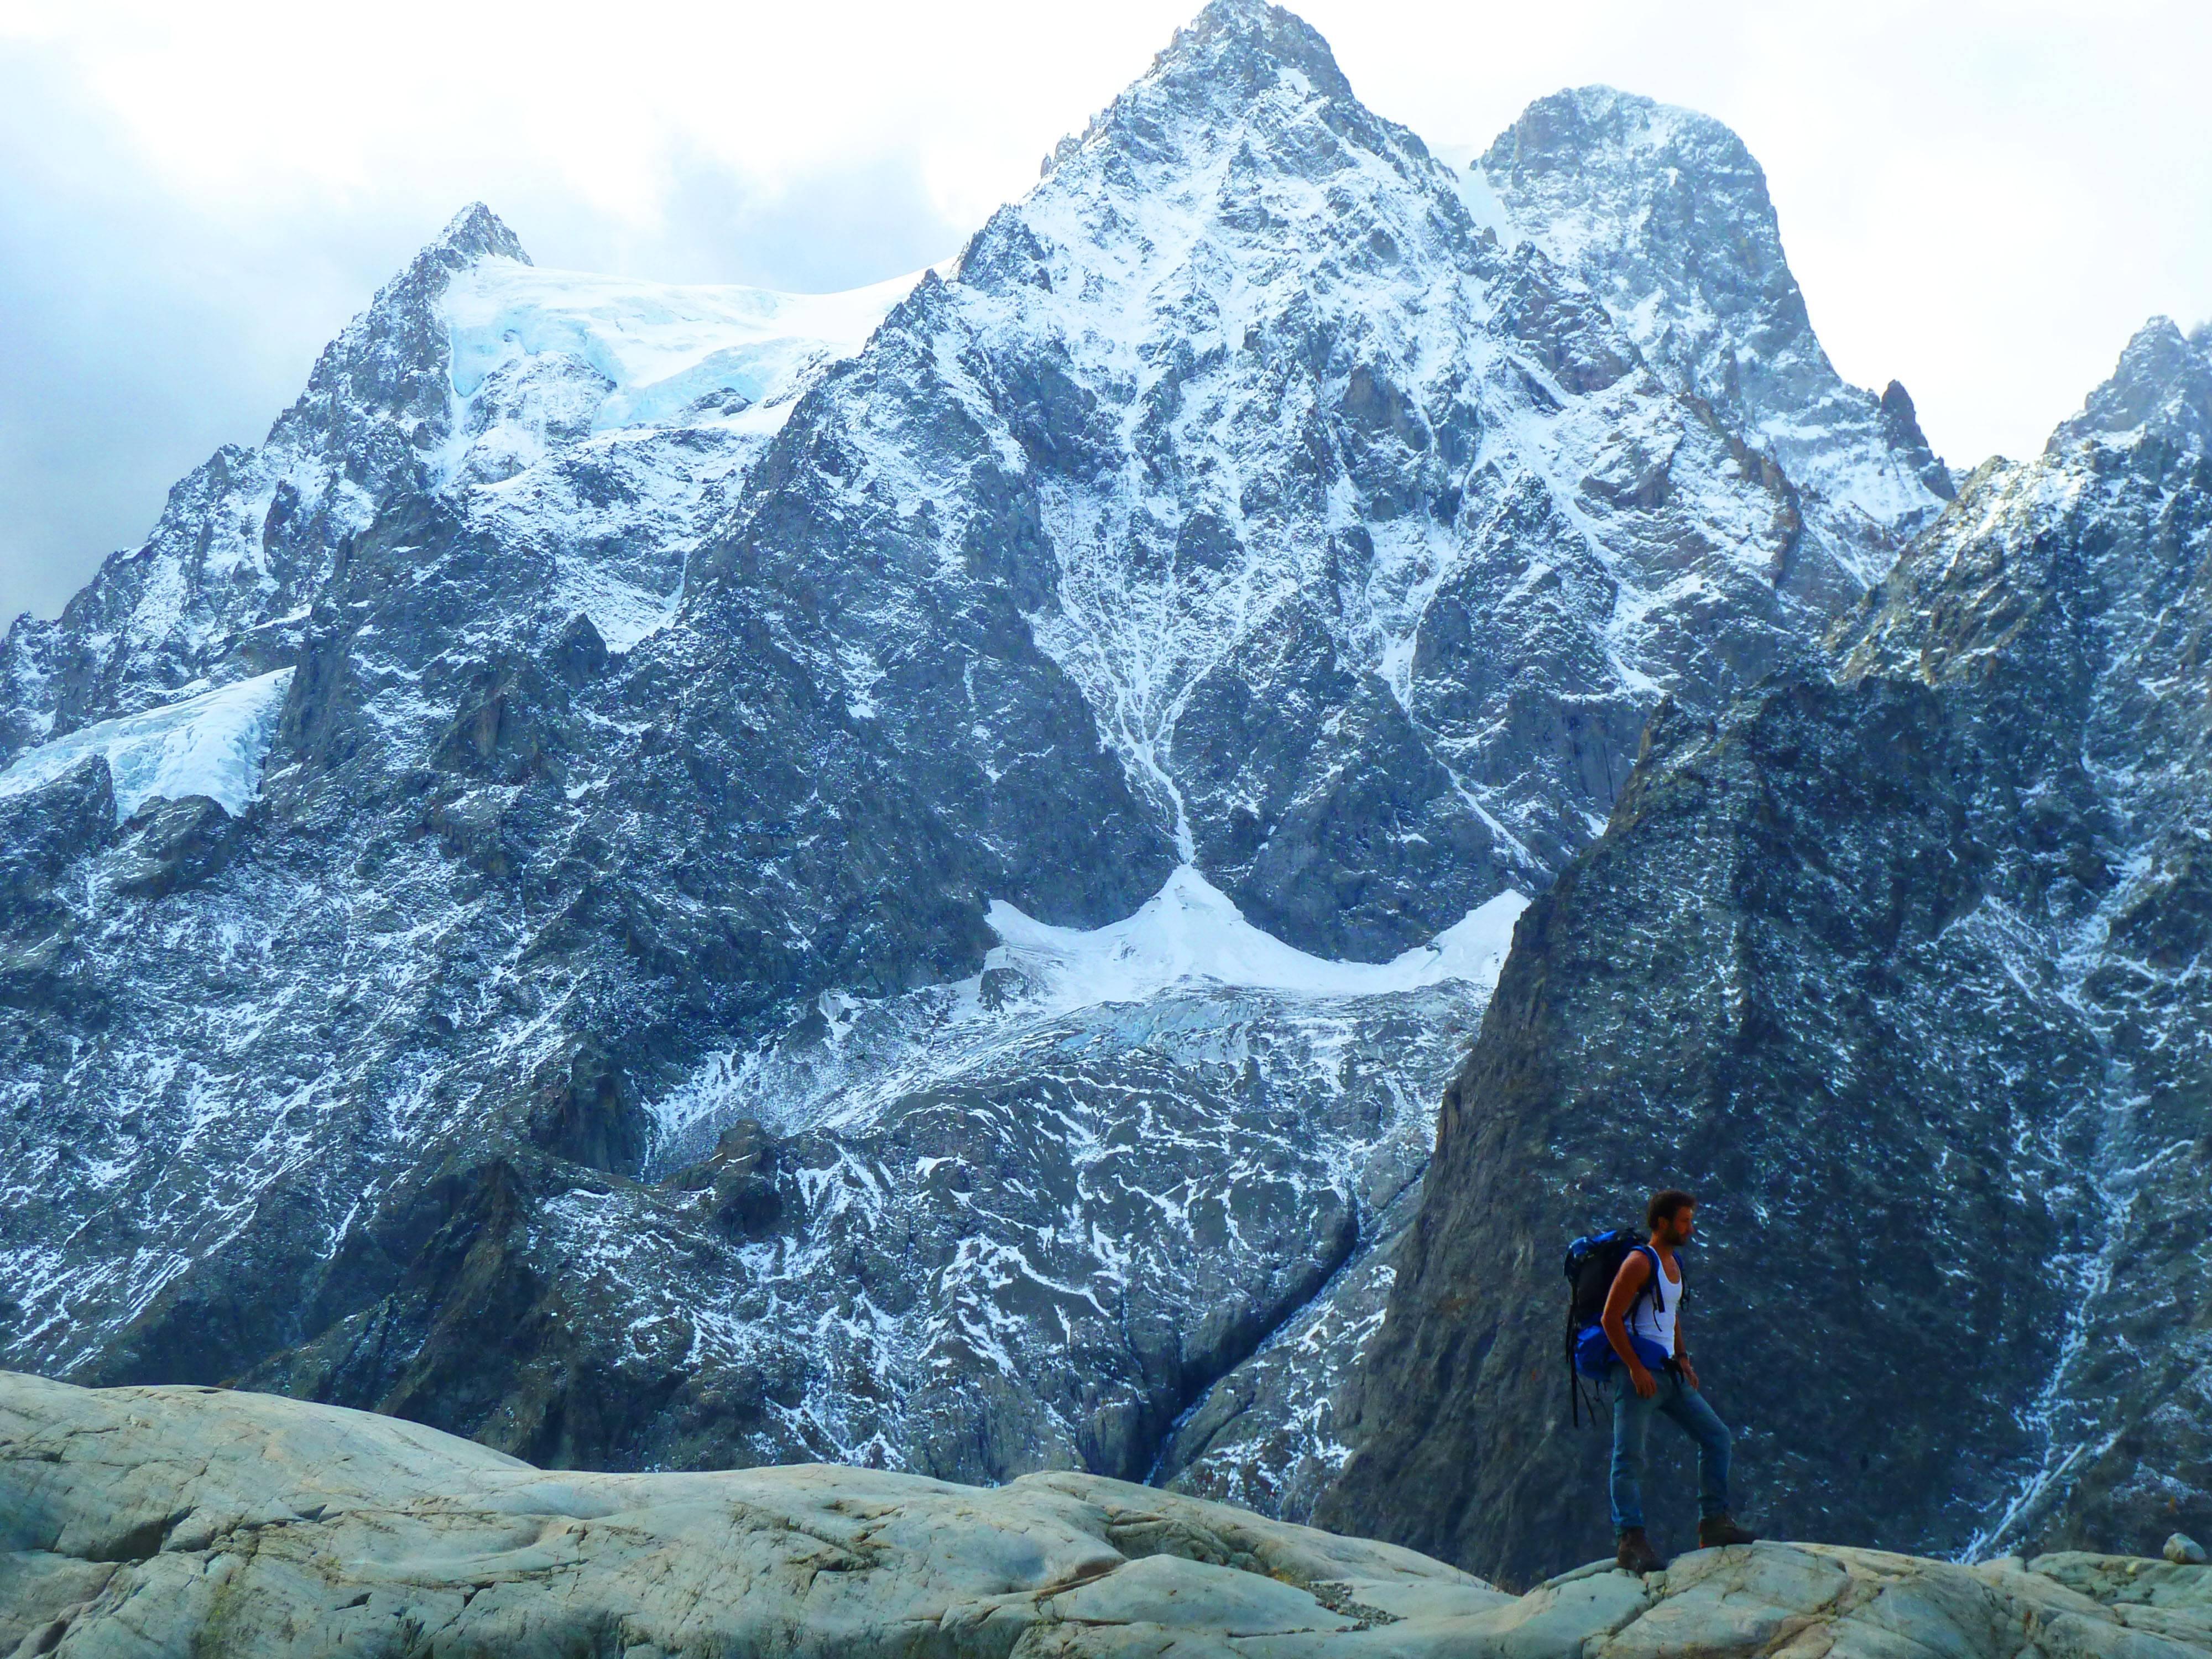 Photo 3: Le refuge du Glacier Blanc